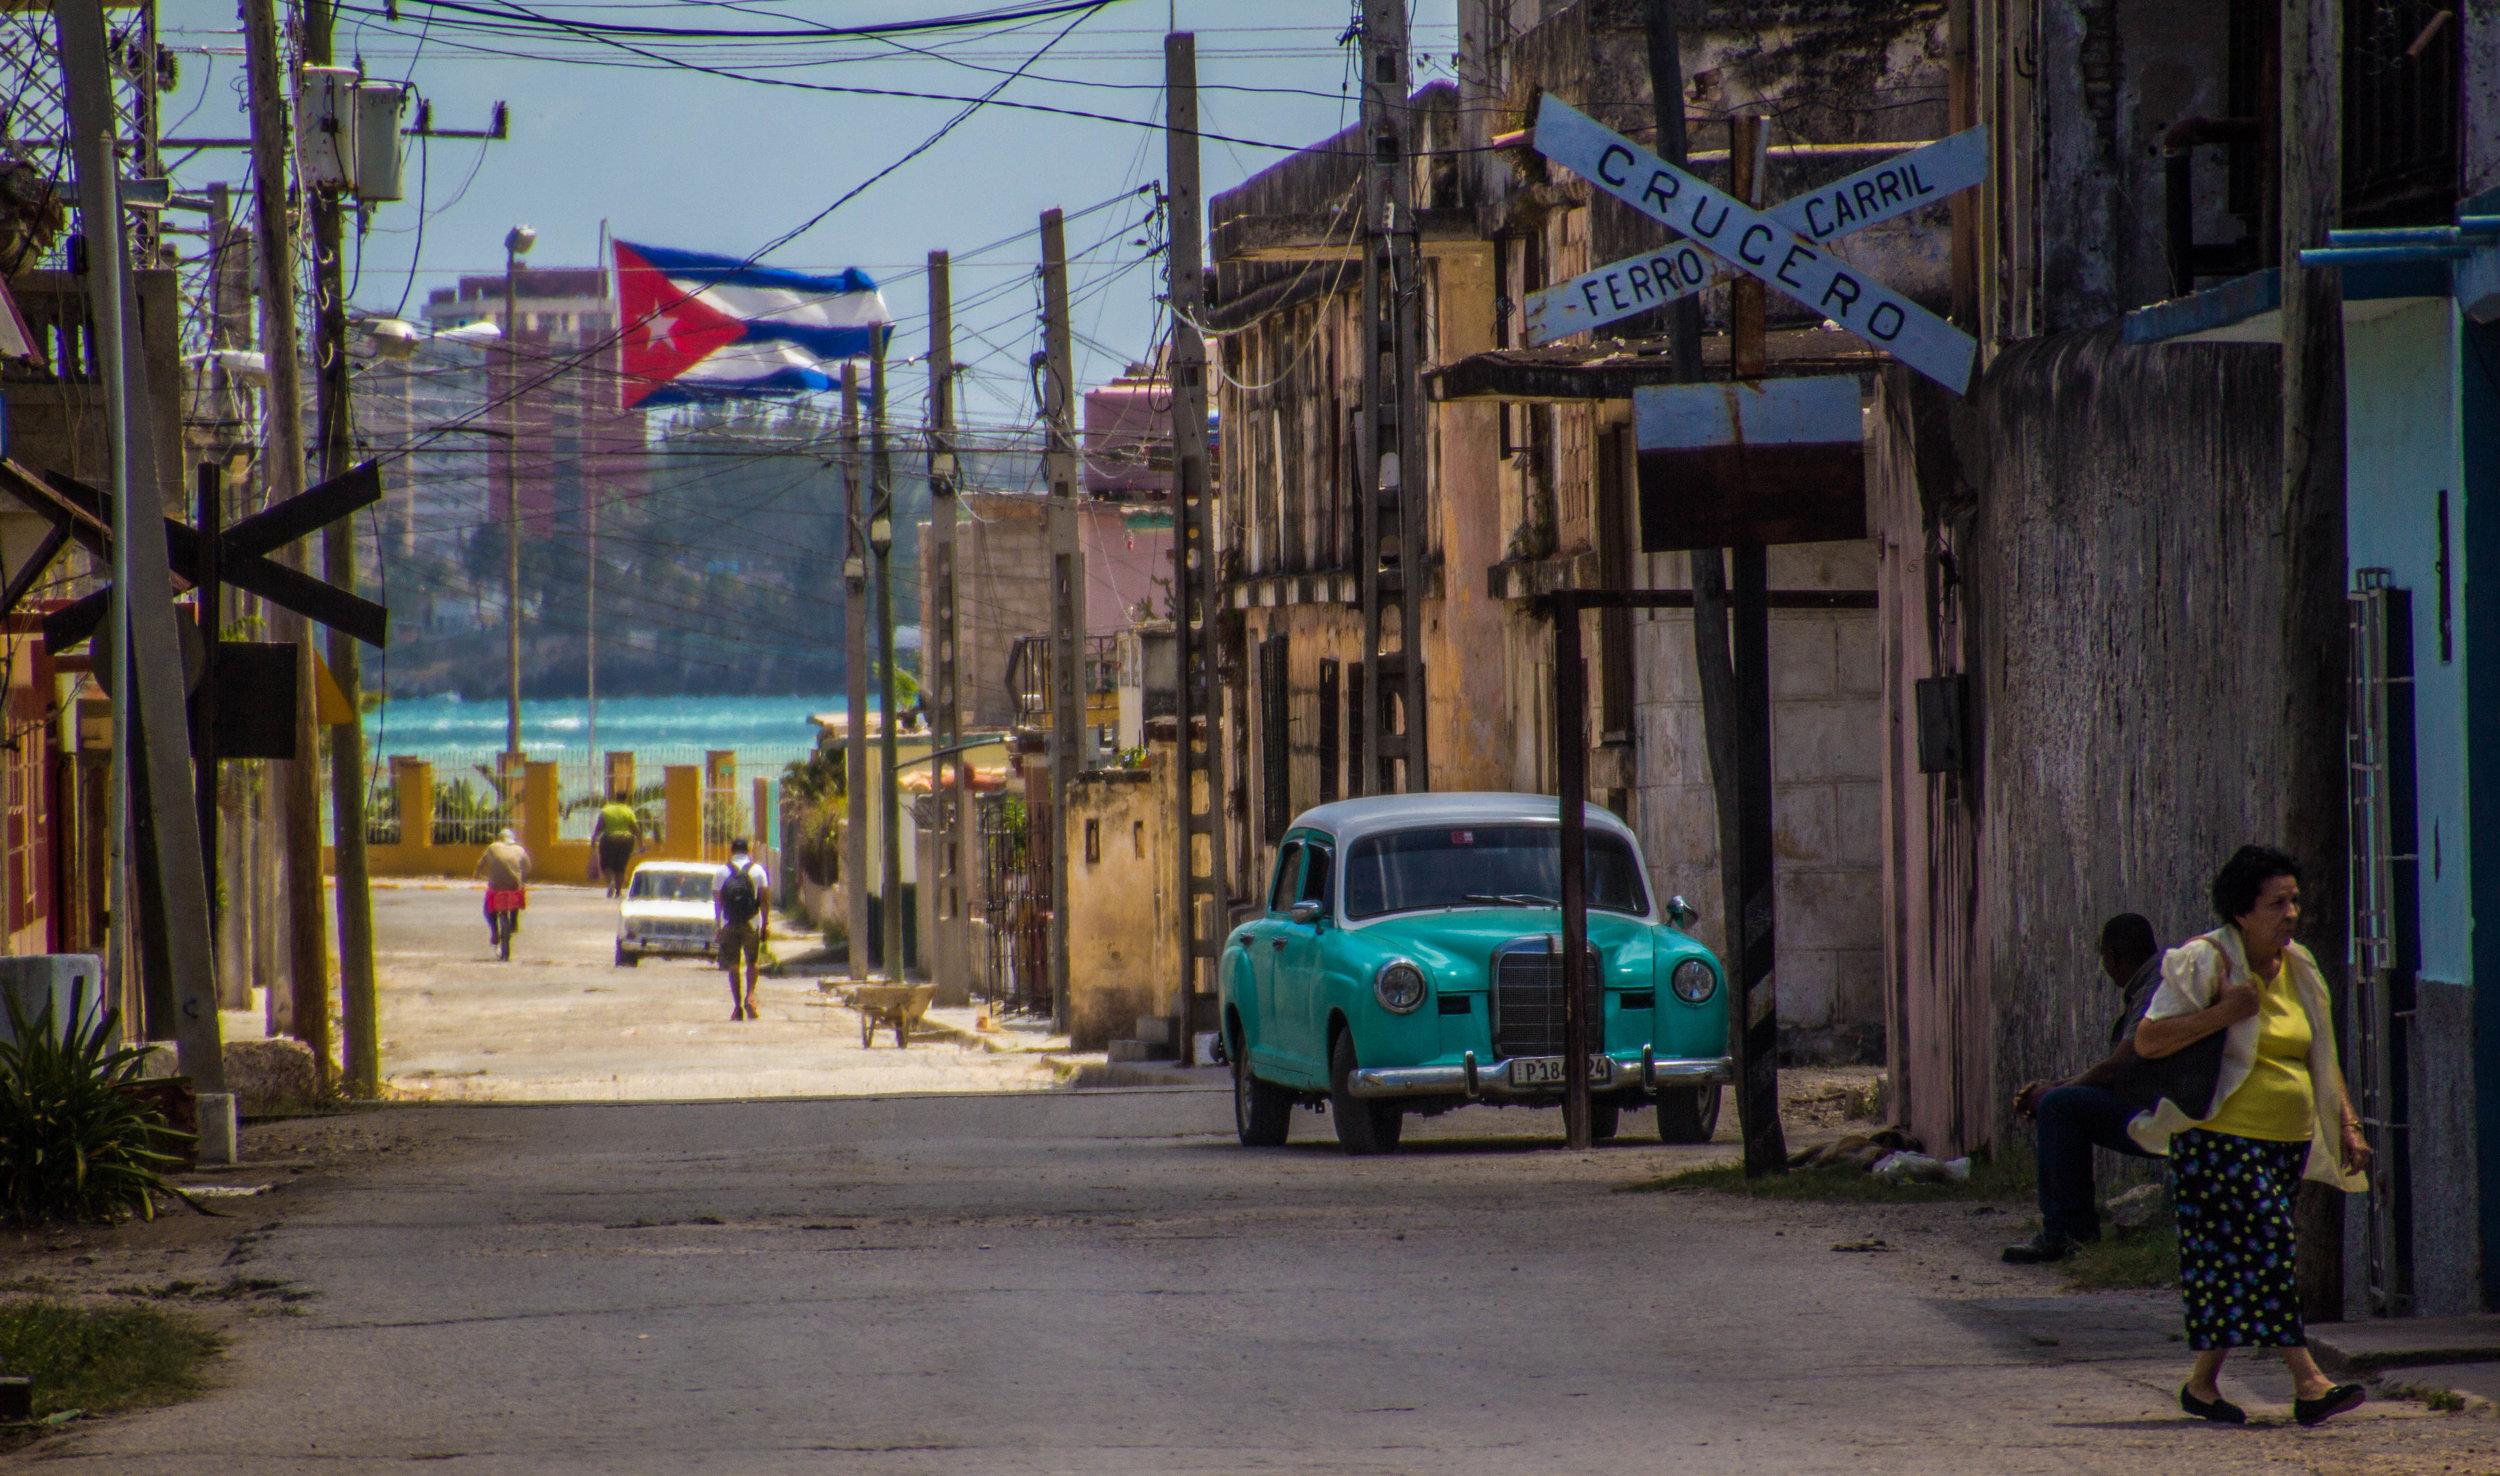 matanzas cuba streets-1-2-2.jpg